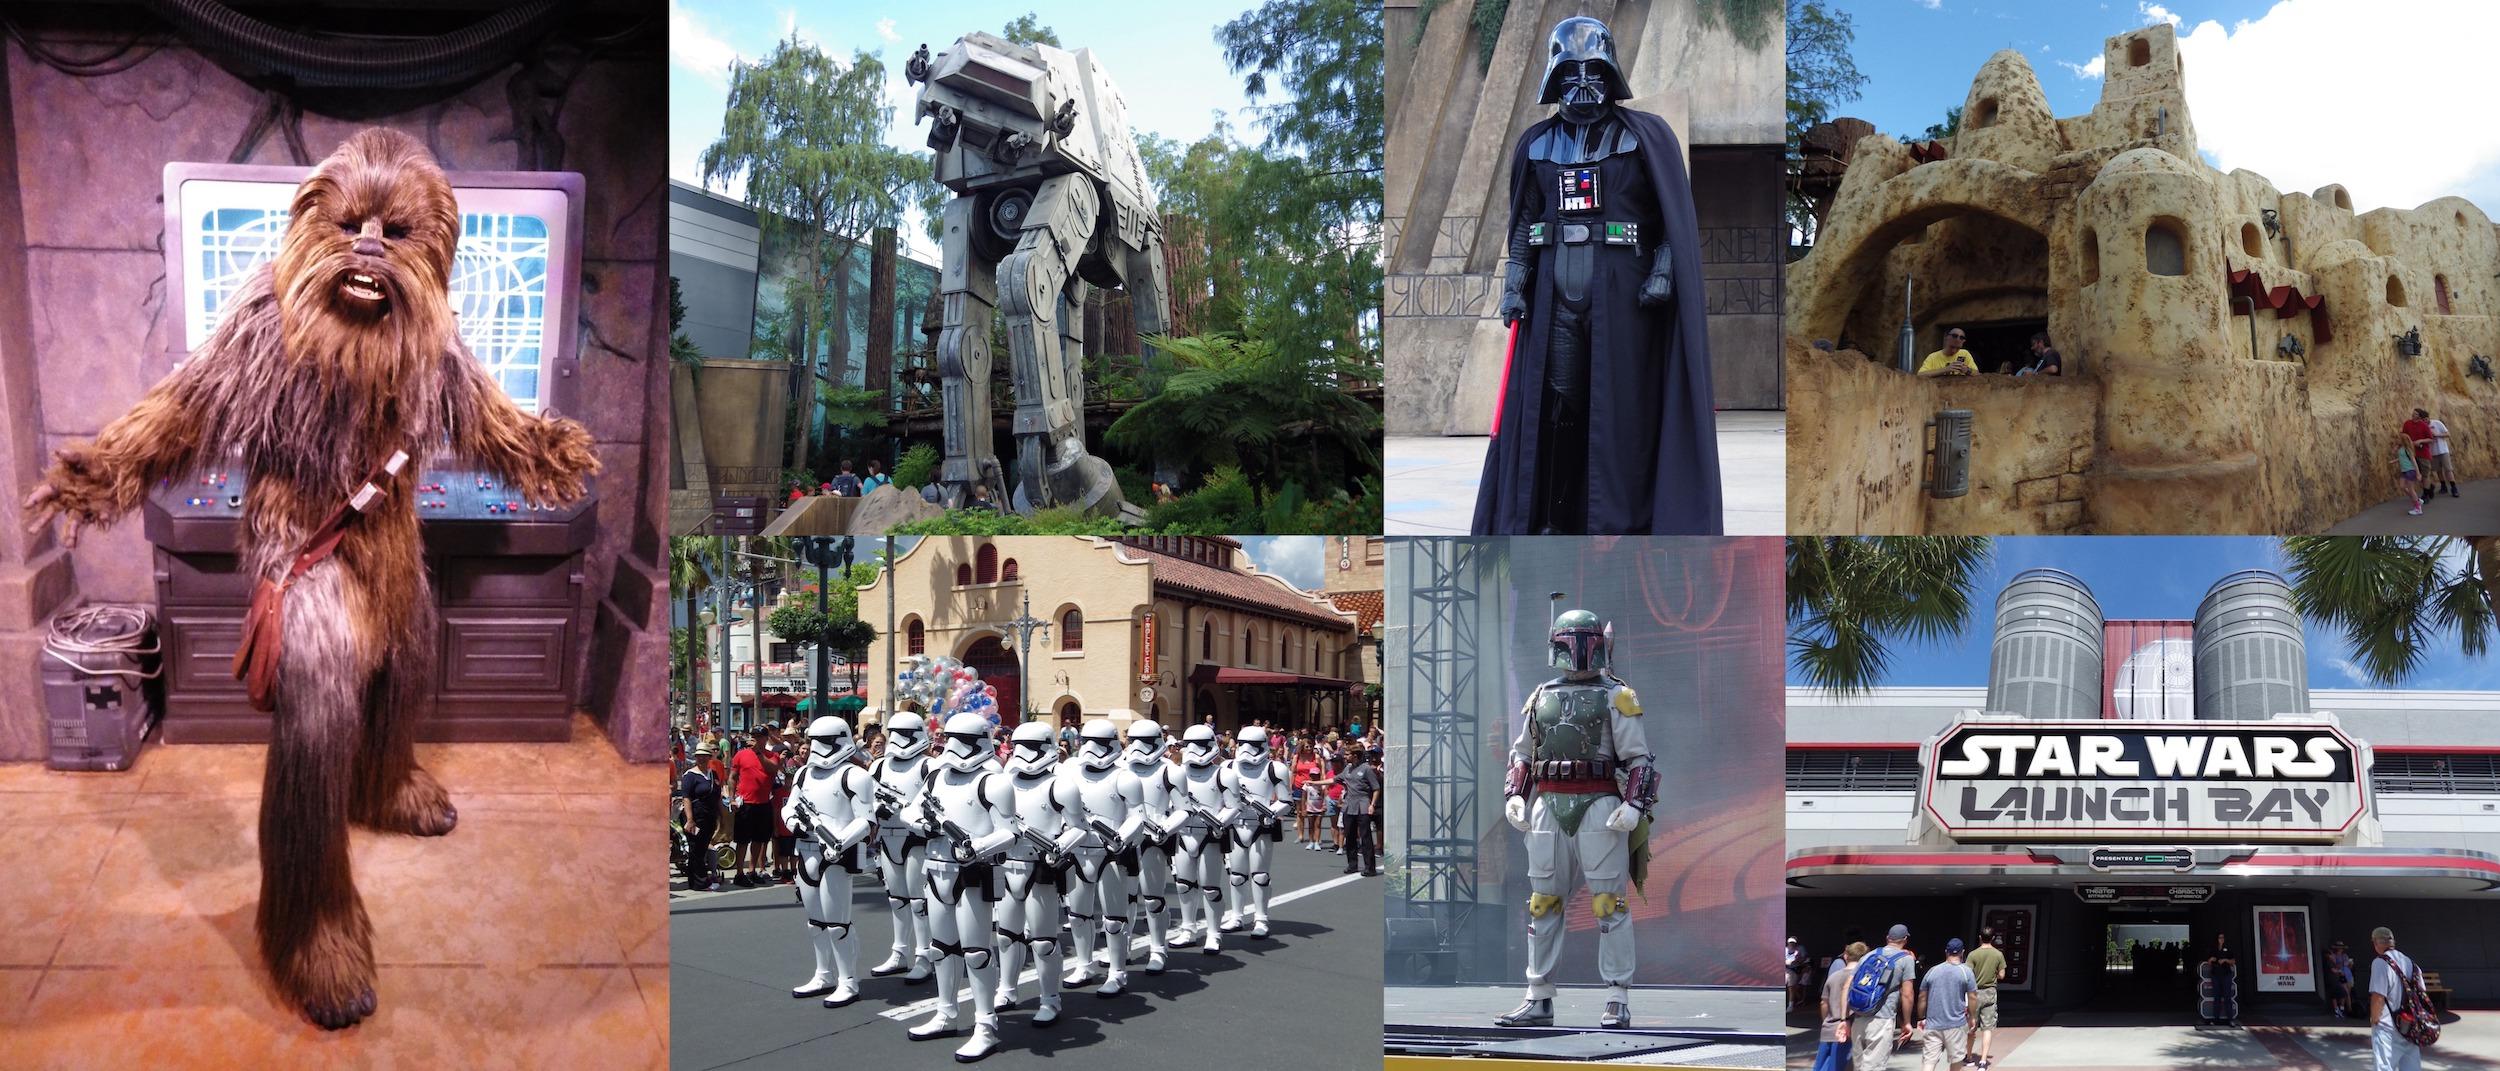 Hollywood-Studios-Star-Wars-001-3x7.jpg